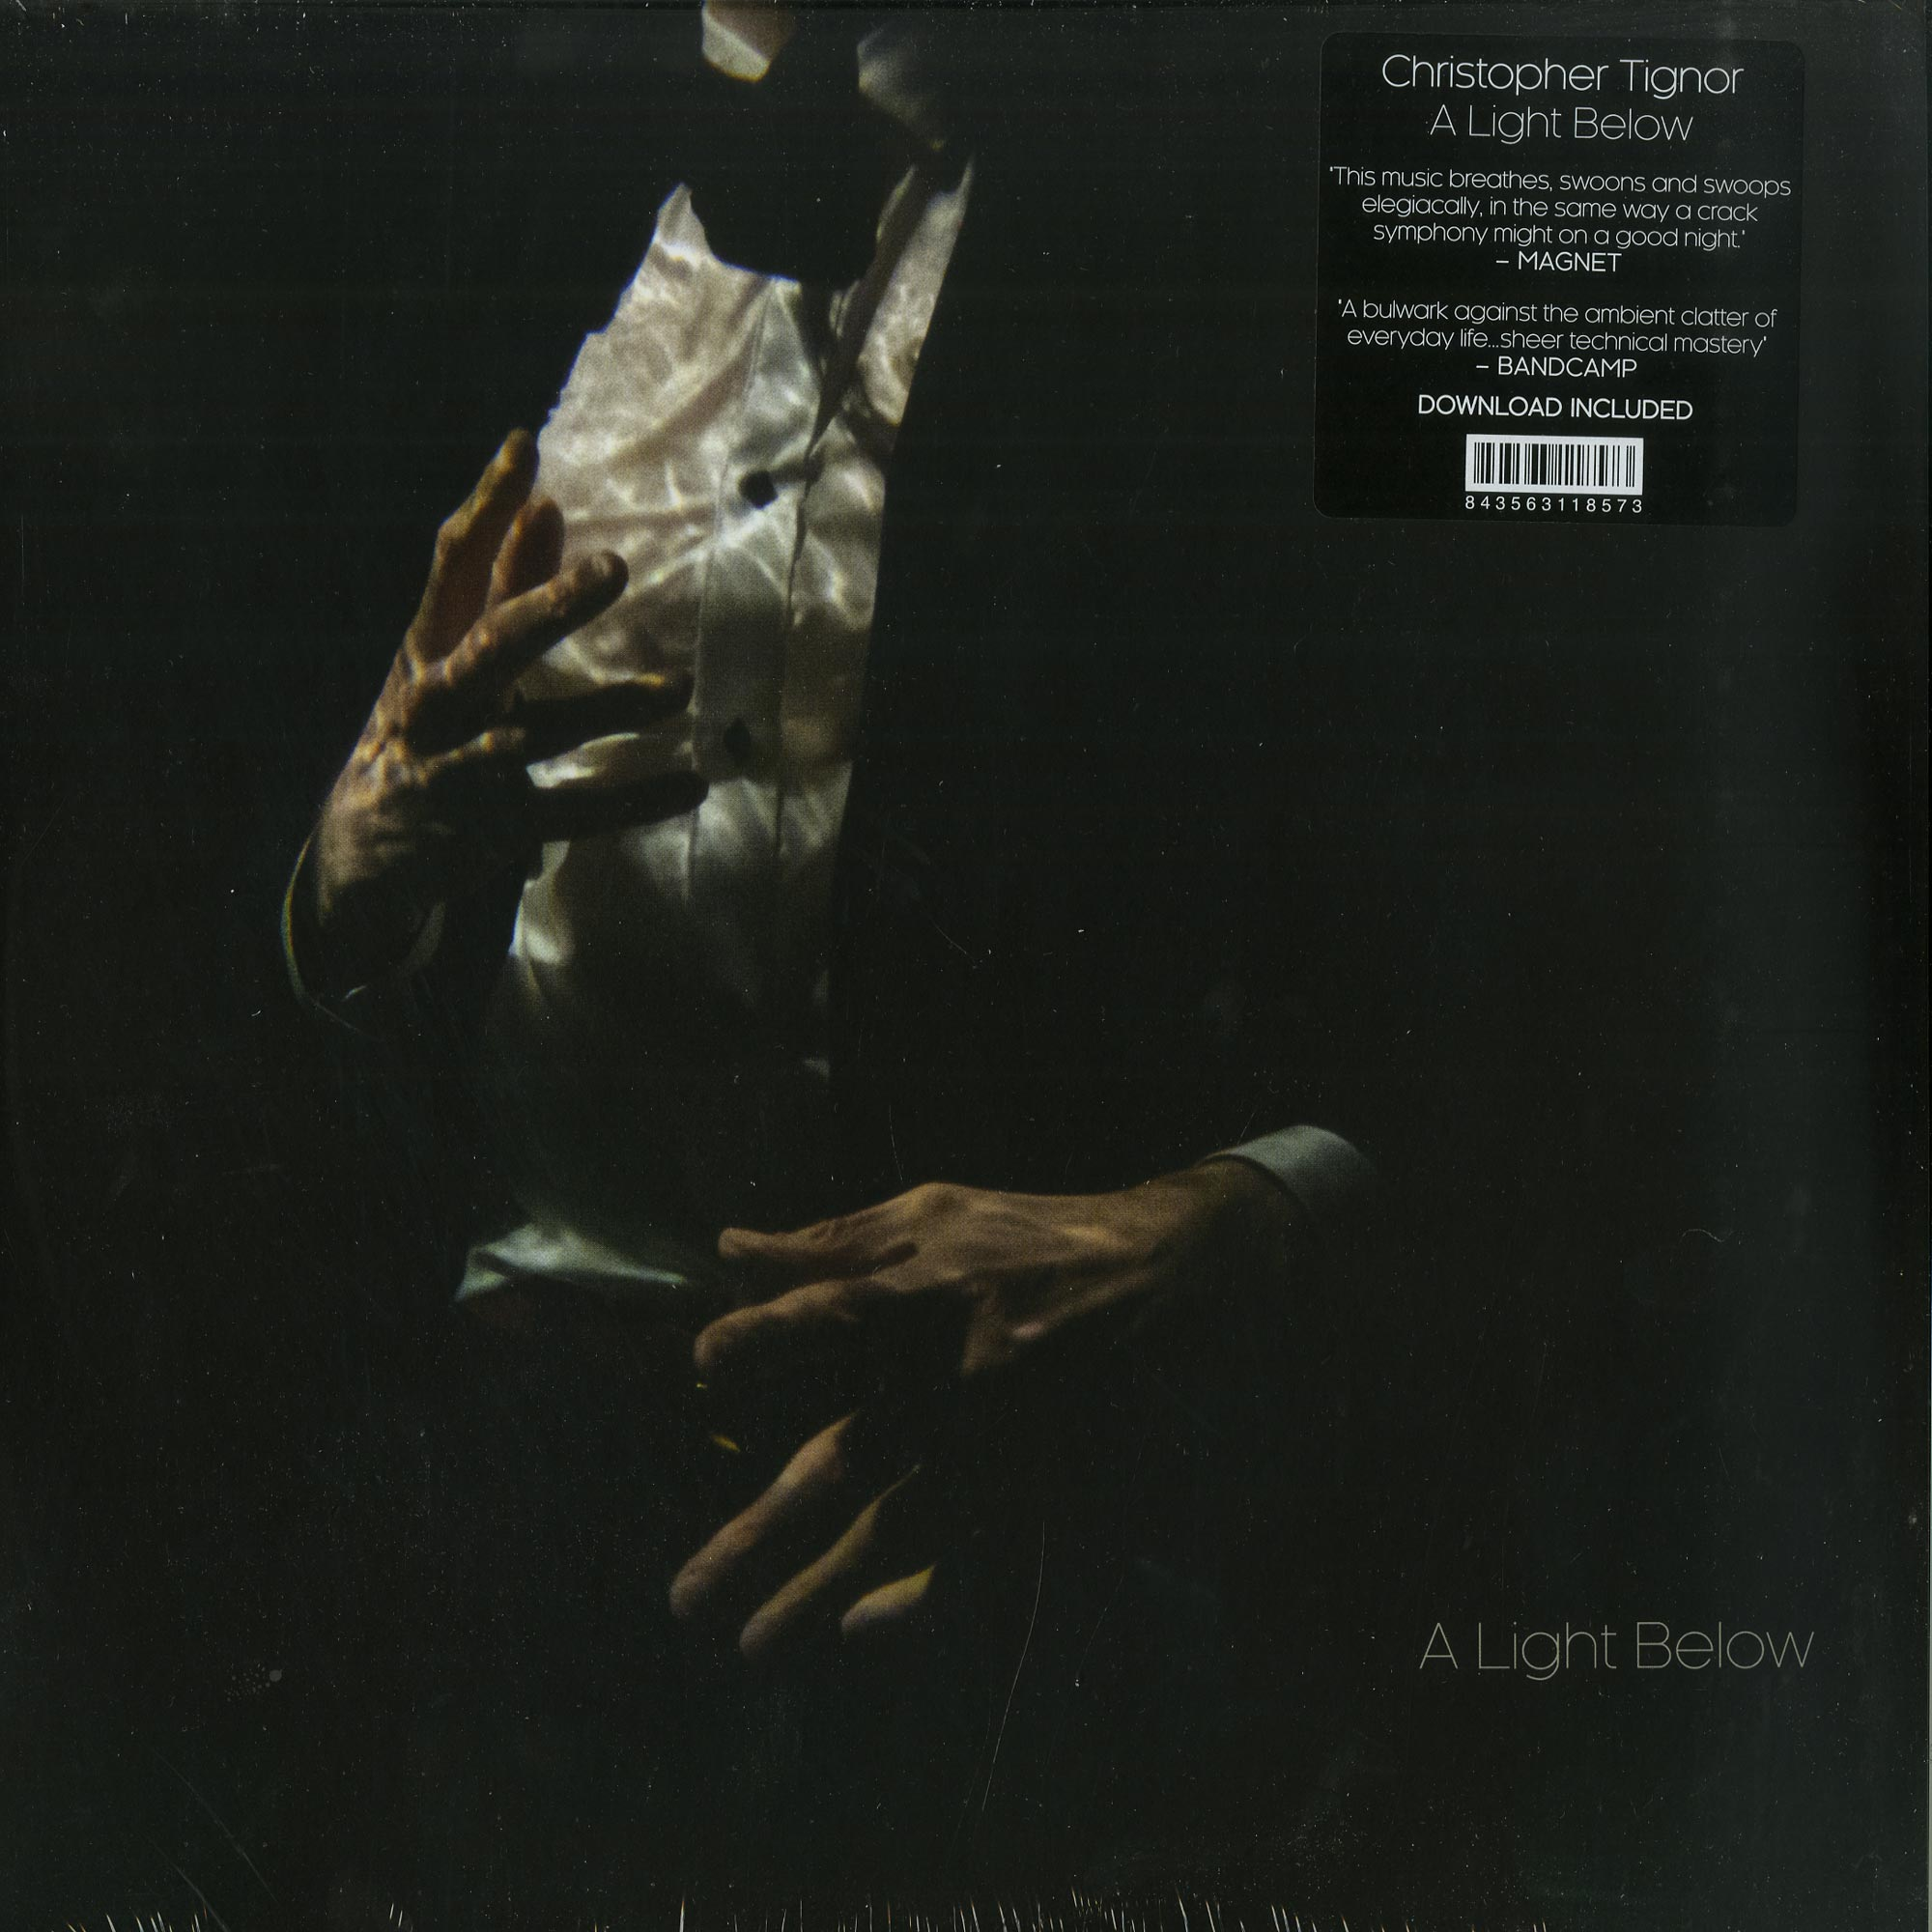 Christopher Tignor - A LIGHT BELOW